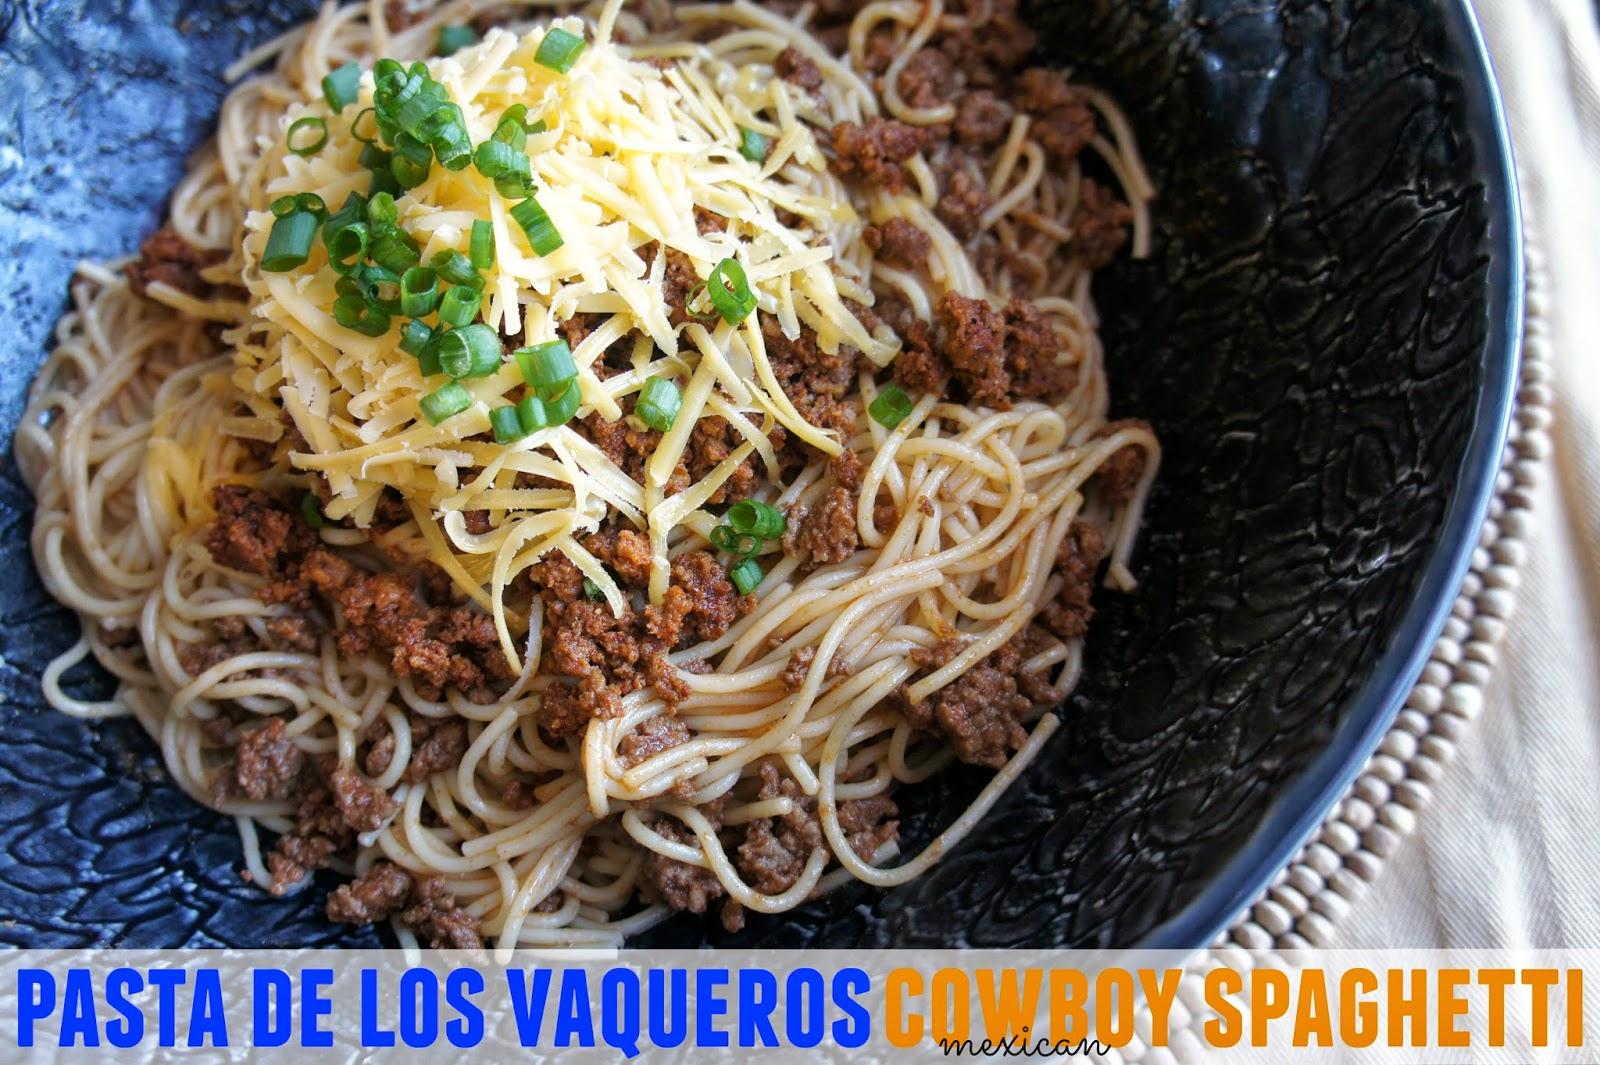 #BarillaFiesta Mexican Cowboy Spaghetti using chorizo, ground sirloin, cheddar and green onions